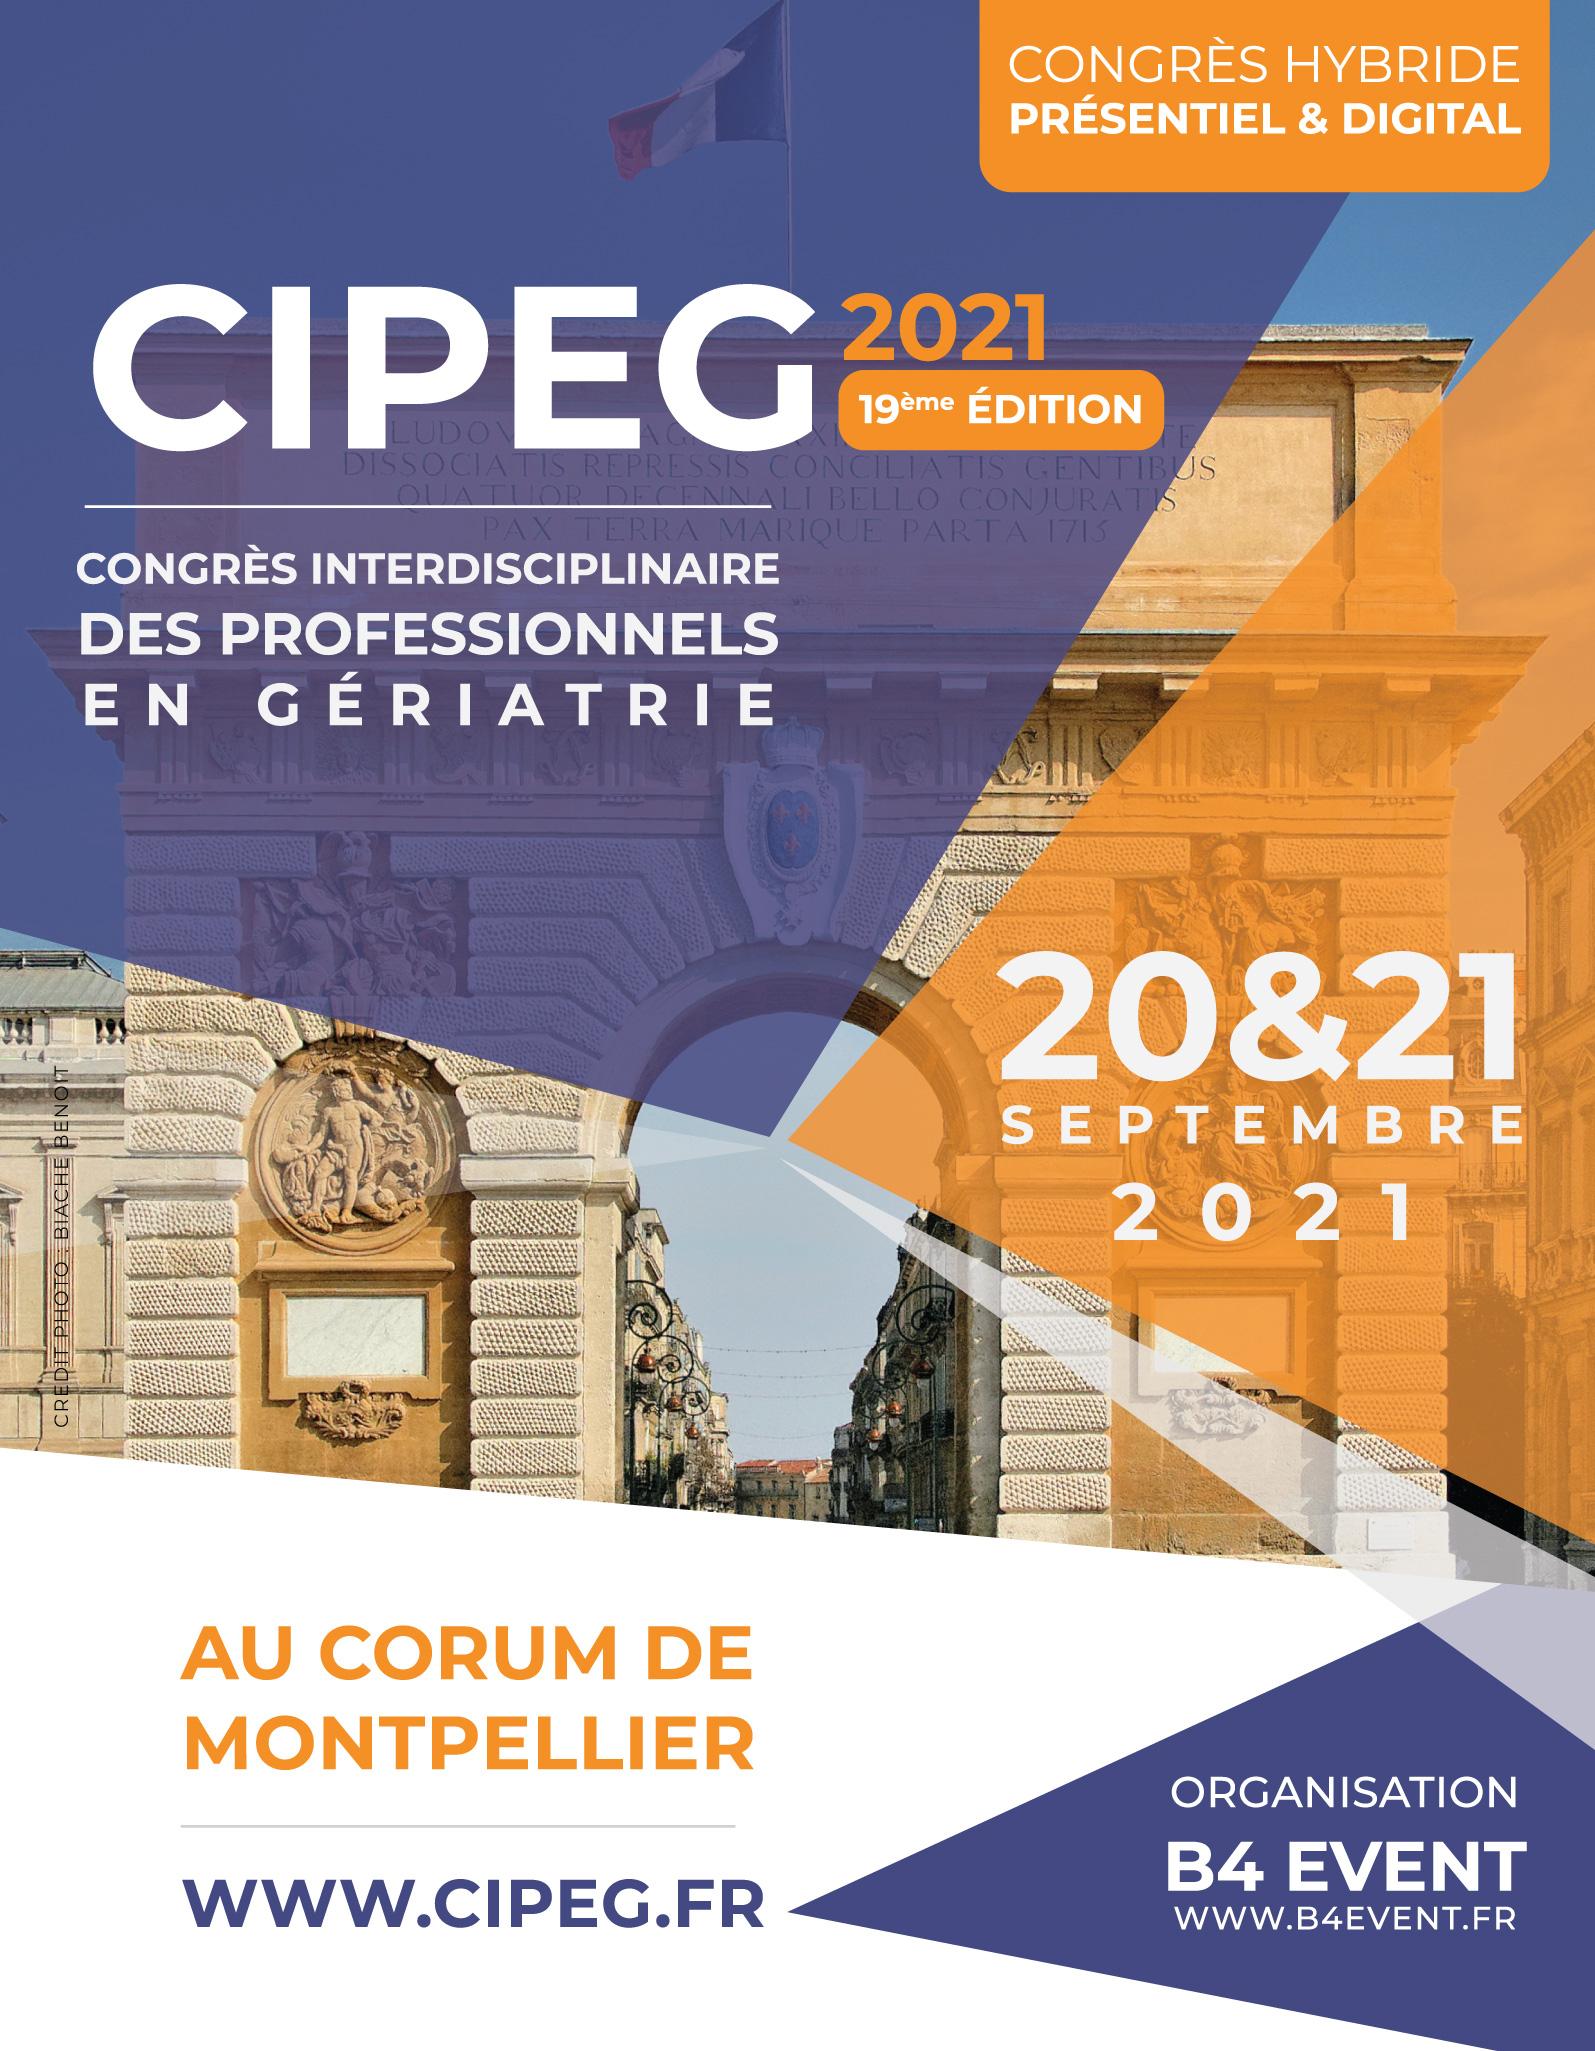 CIPEG2021_21X27